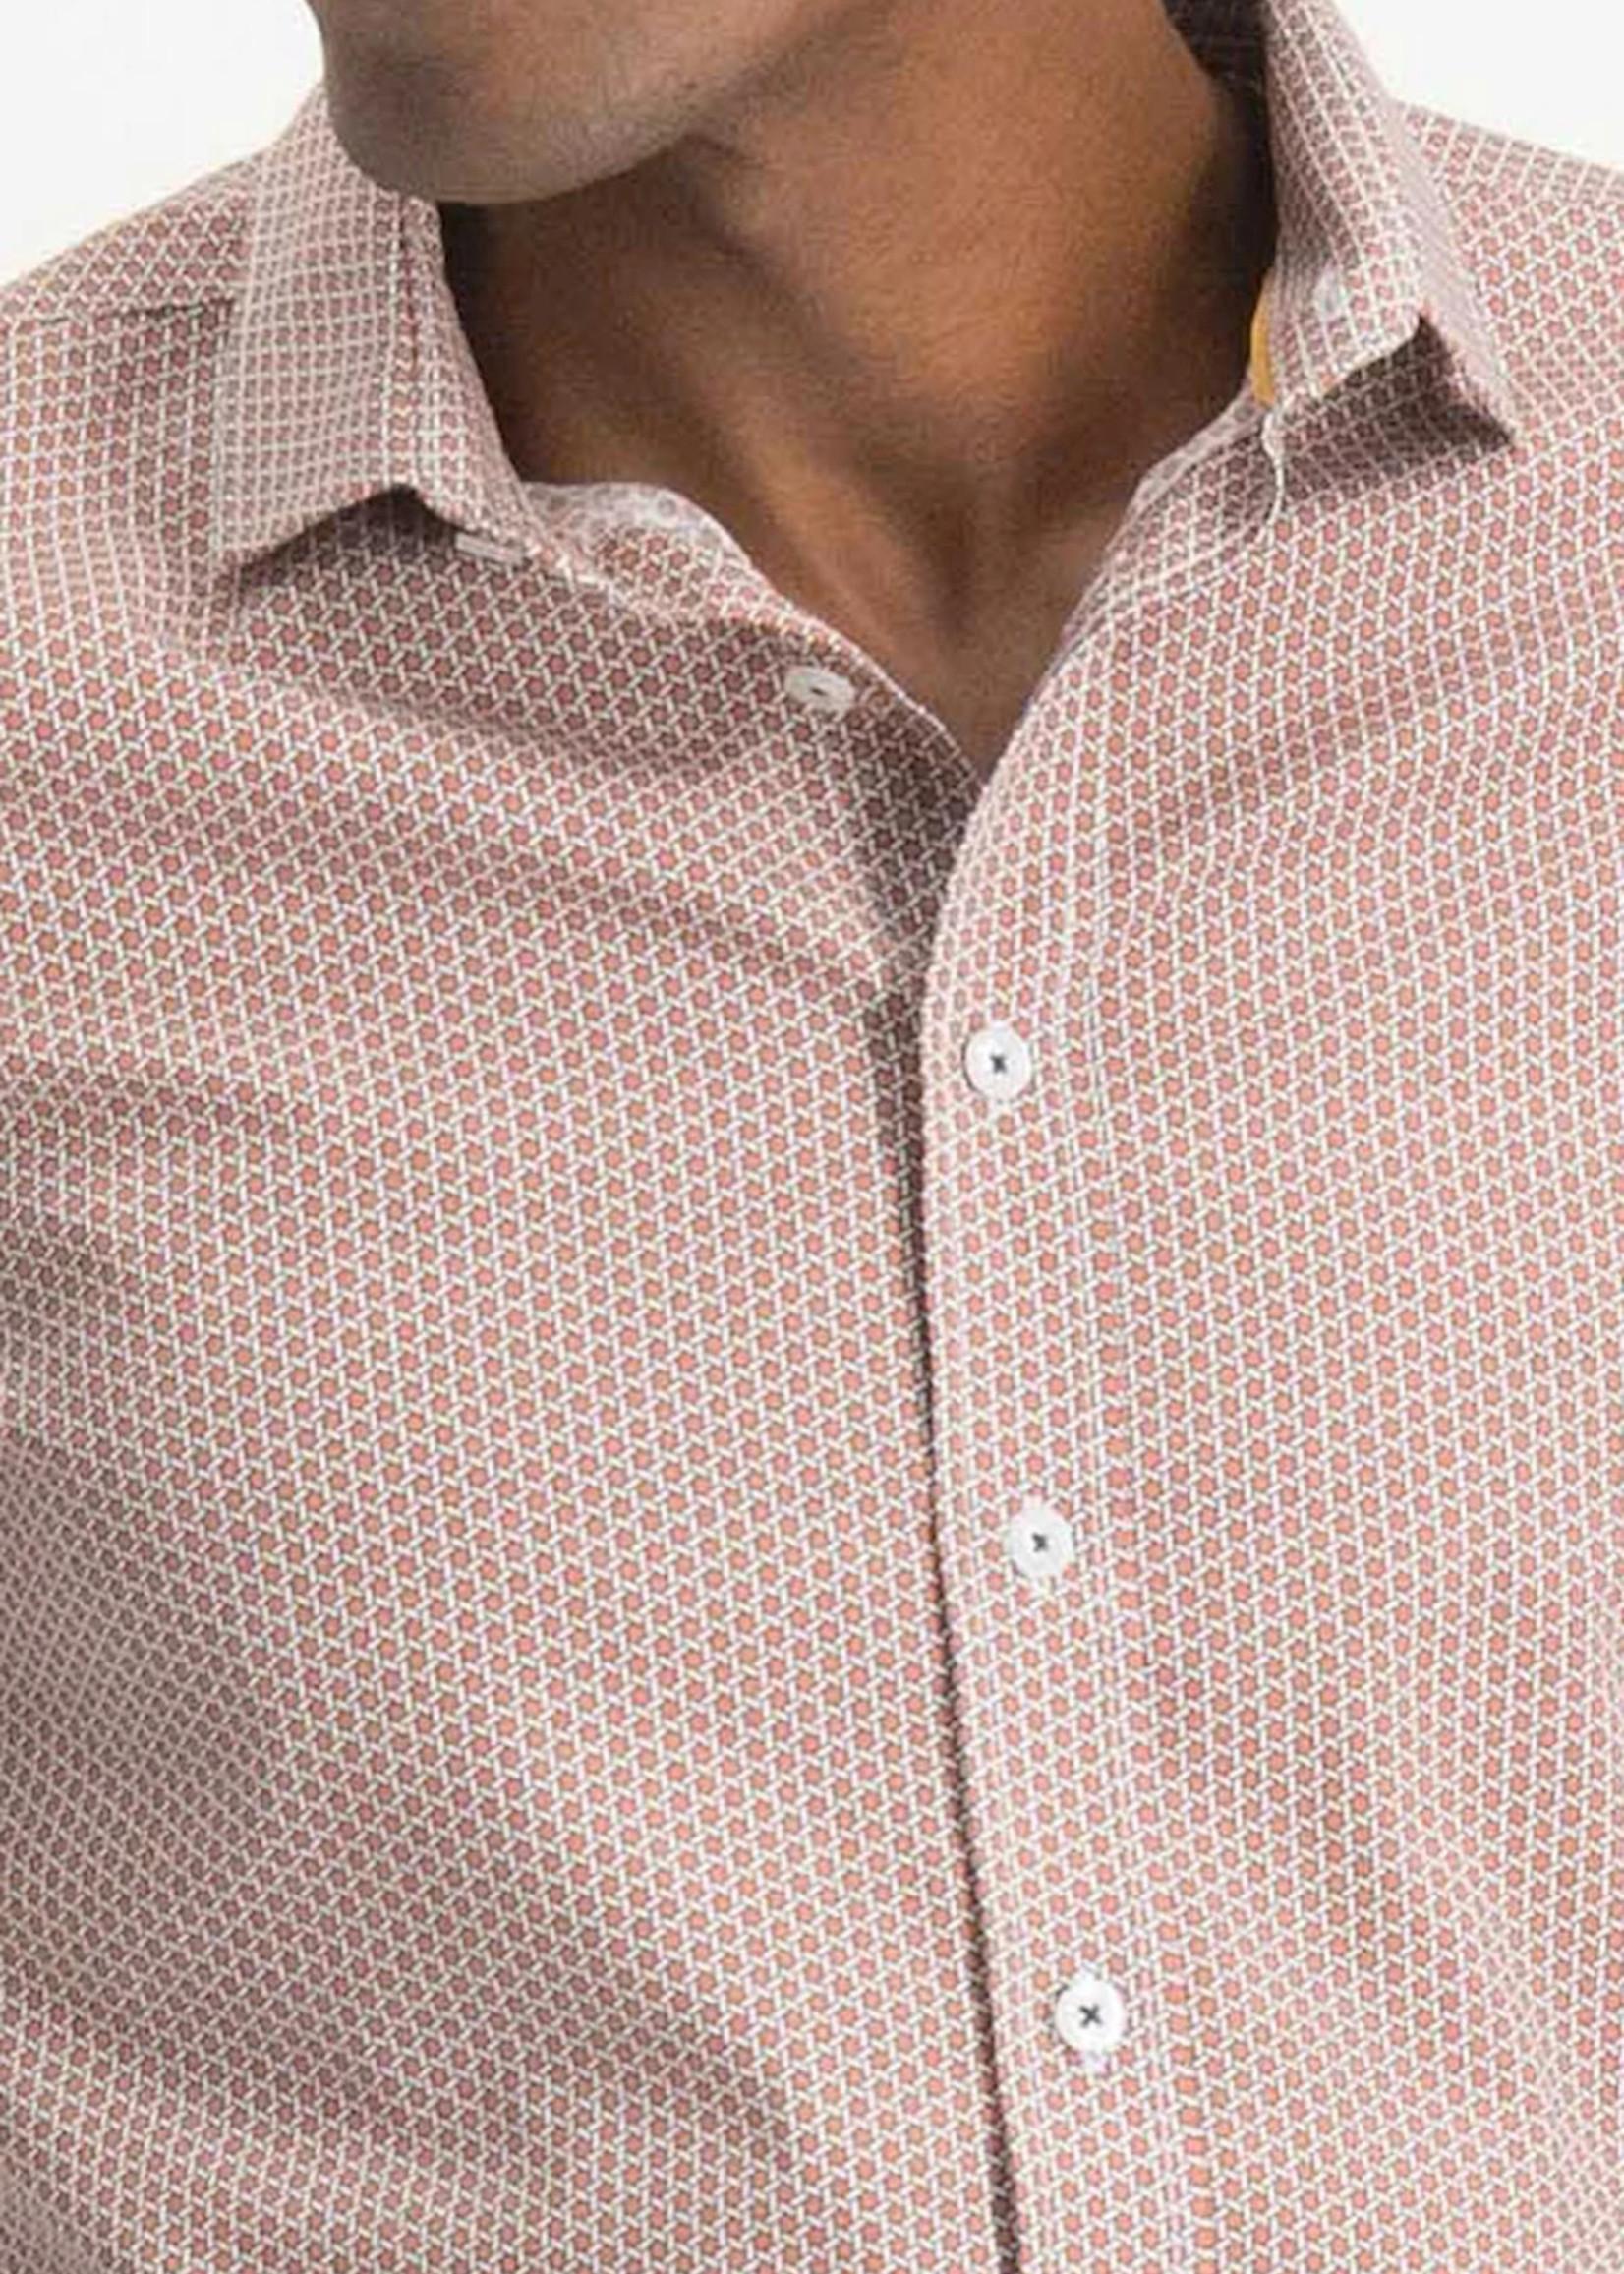 Italian Fit Rotan Design Print Stretch Shirt | Haze & Finn